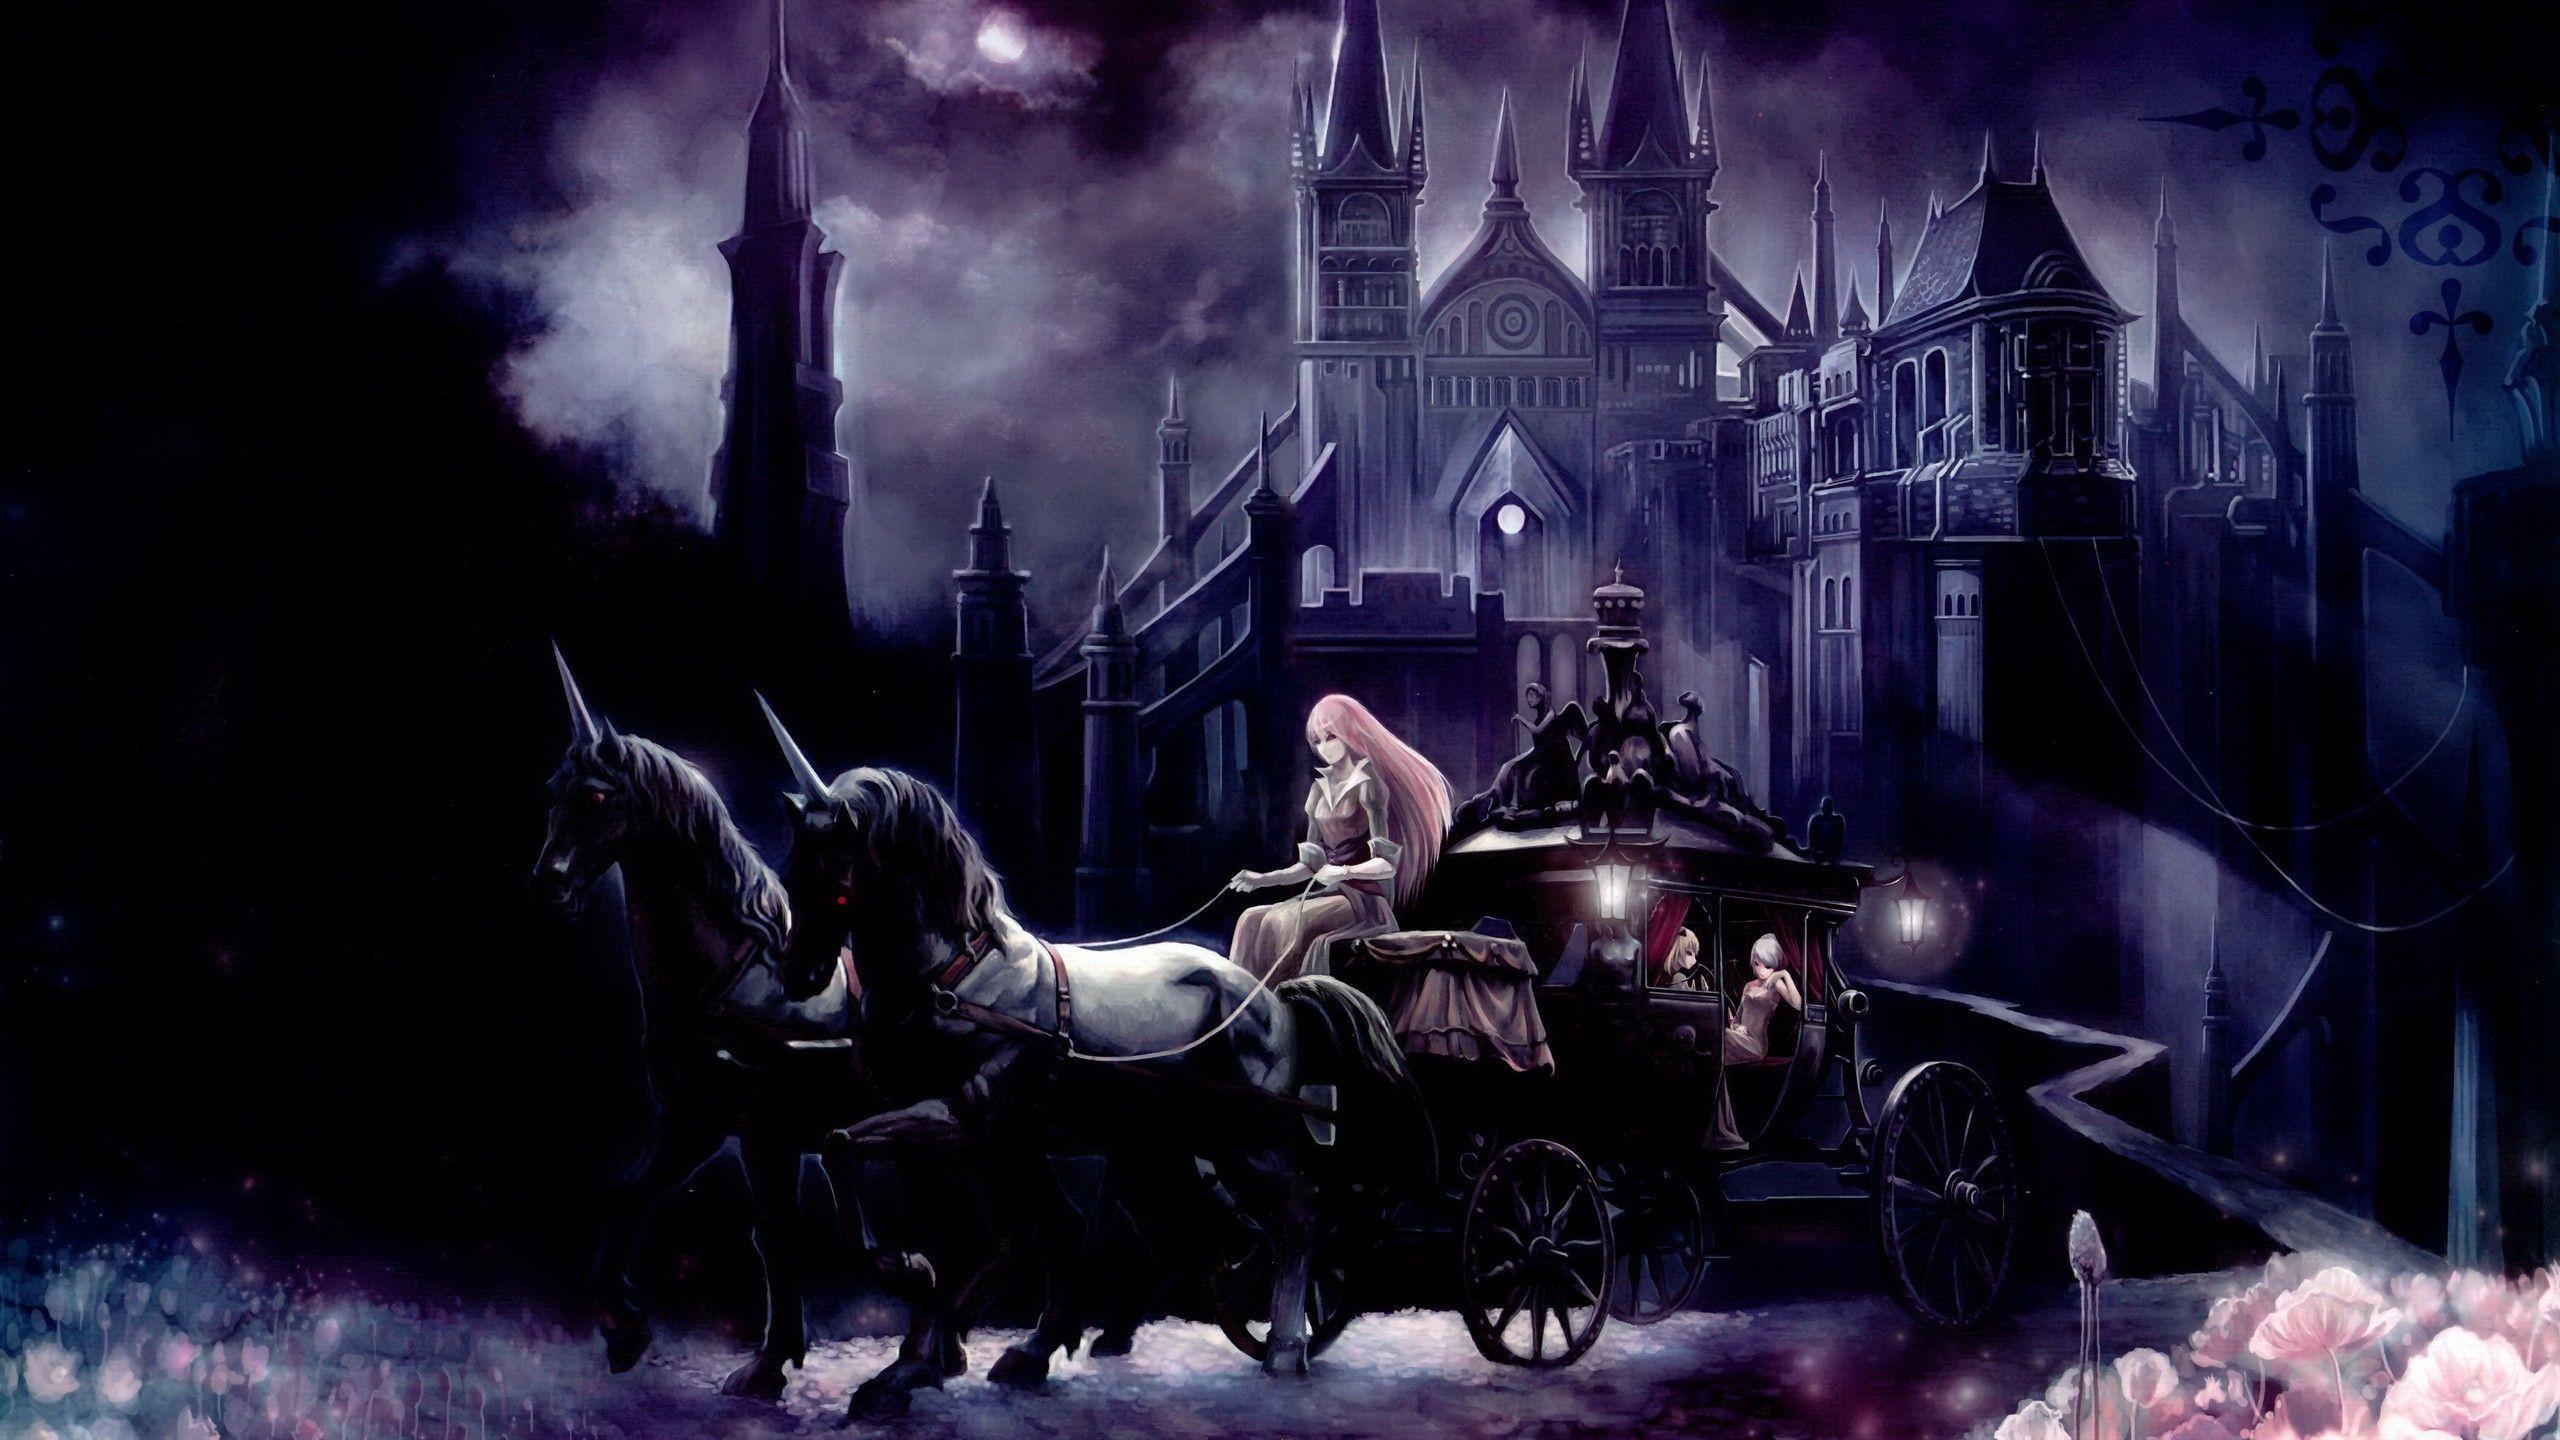 Wonderful Wallpaper Horse Gothic - 5fe129544511b0f54d7c1328b25253c8  You Should Have_1003150.jpg